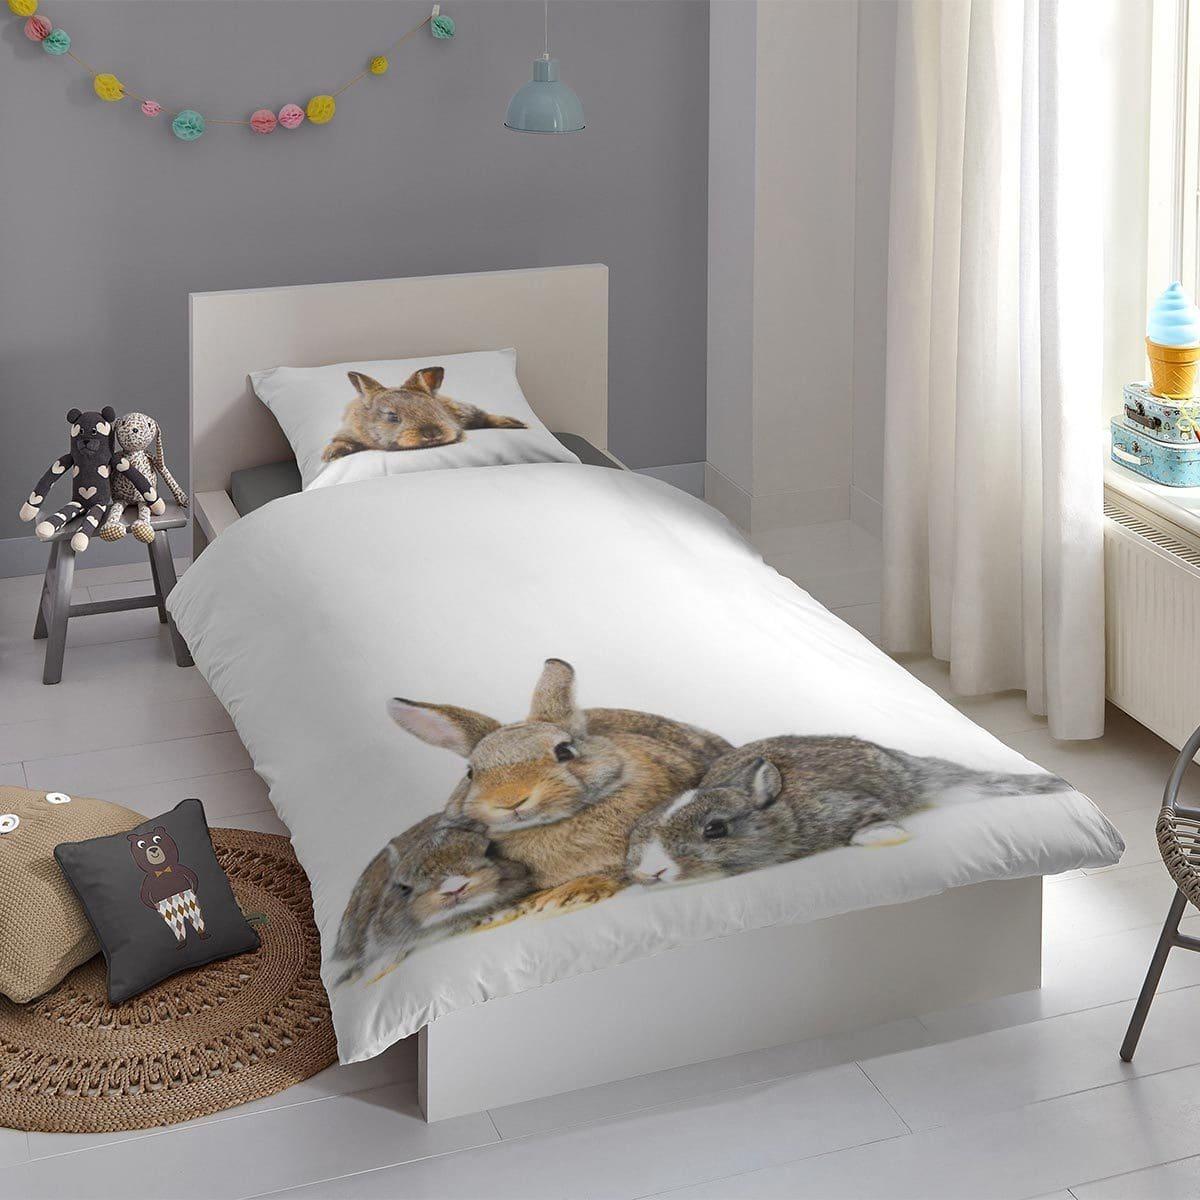 Good Morning Bettwäsche Cute Rabbits white